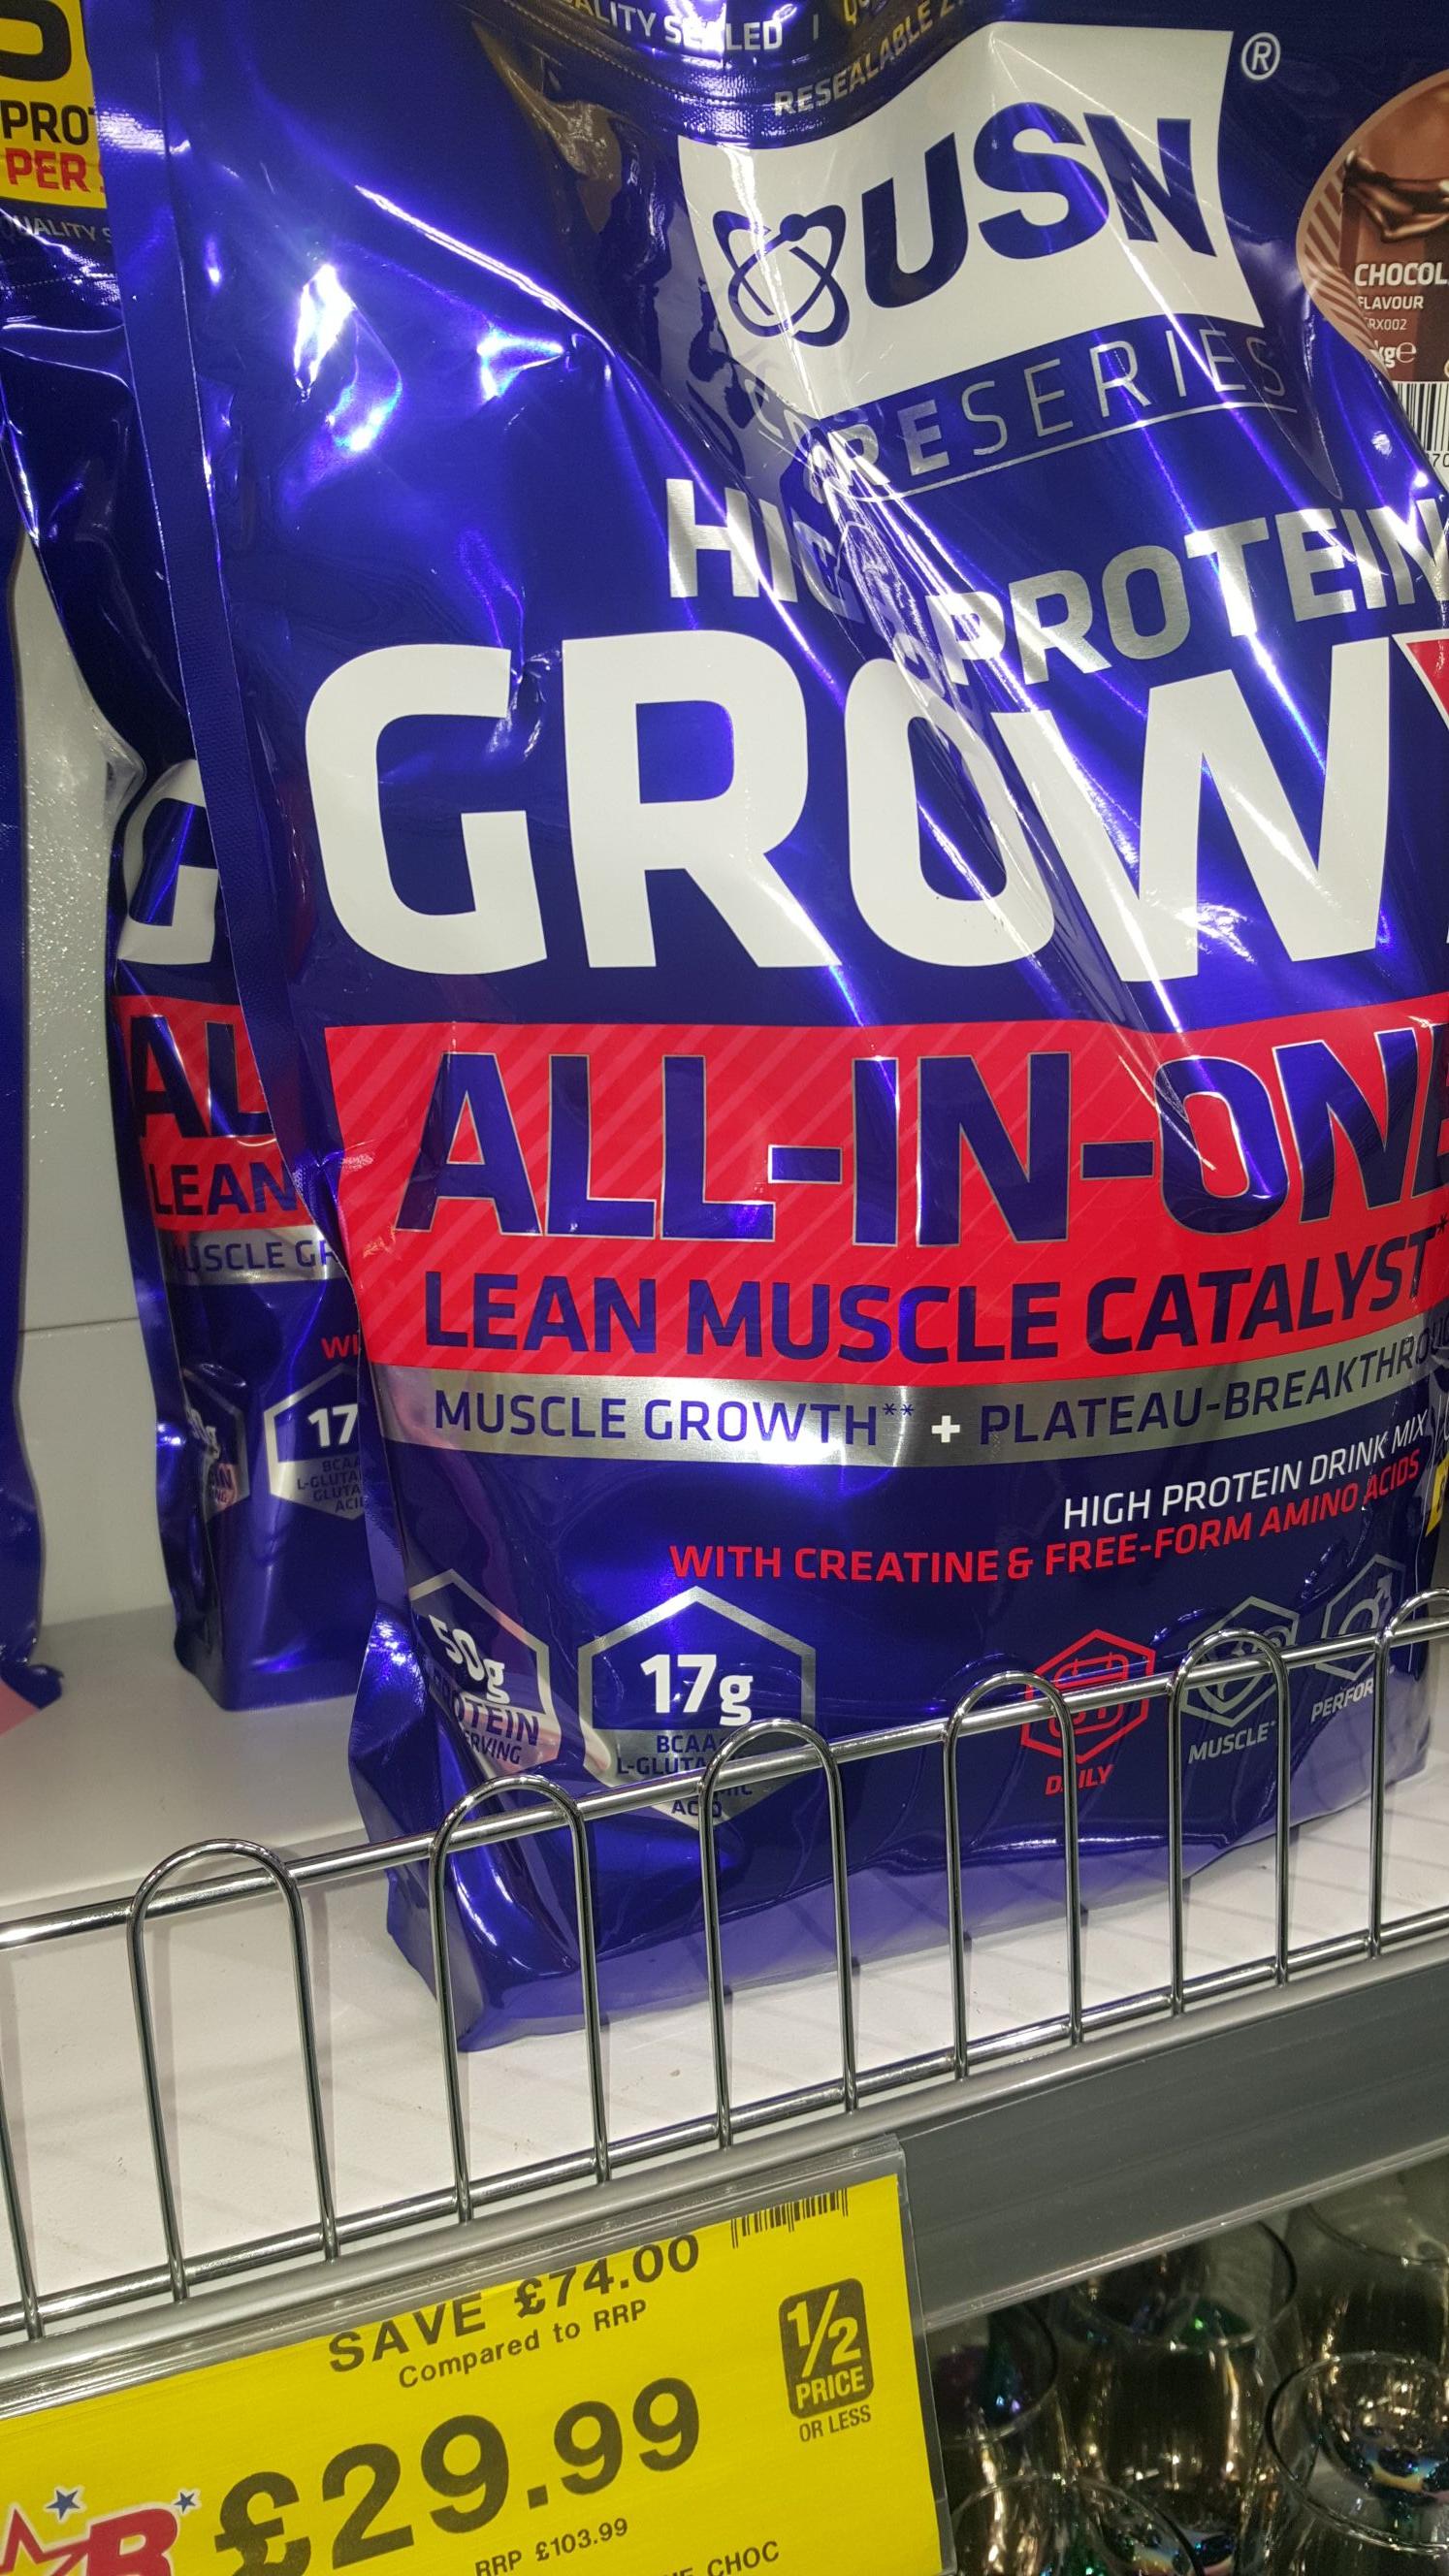 USN 4kg protein mix £29.99 @ Home bargains